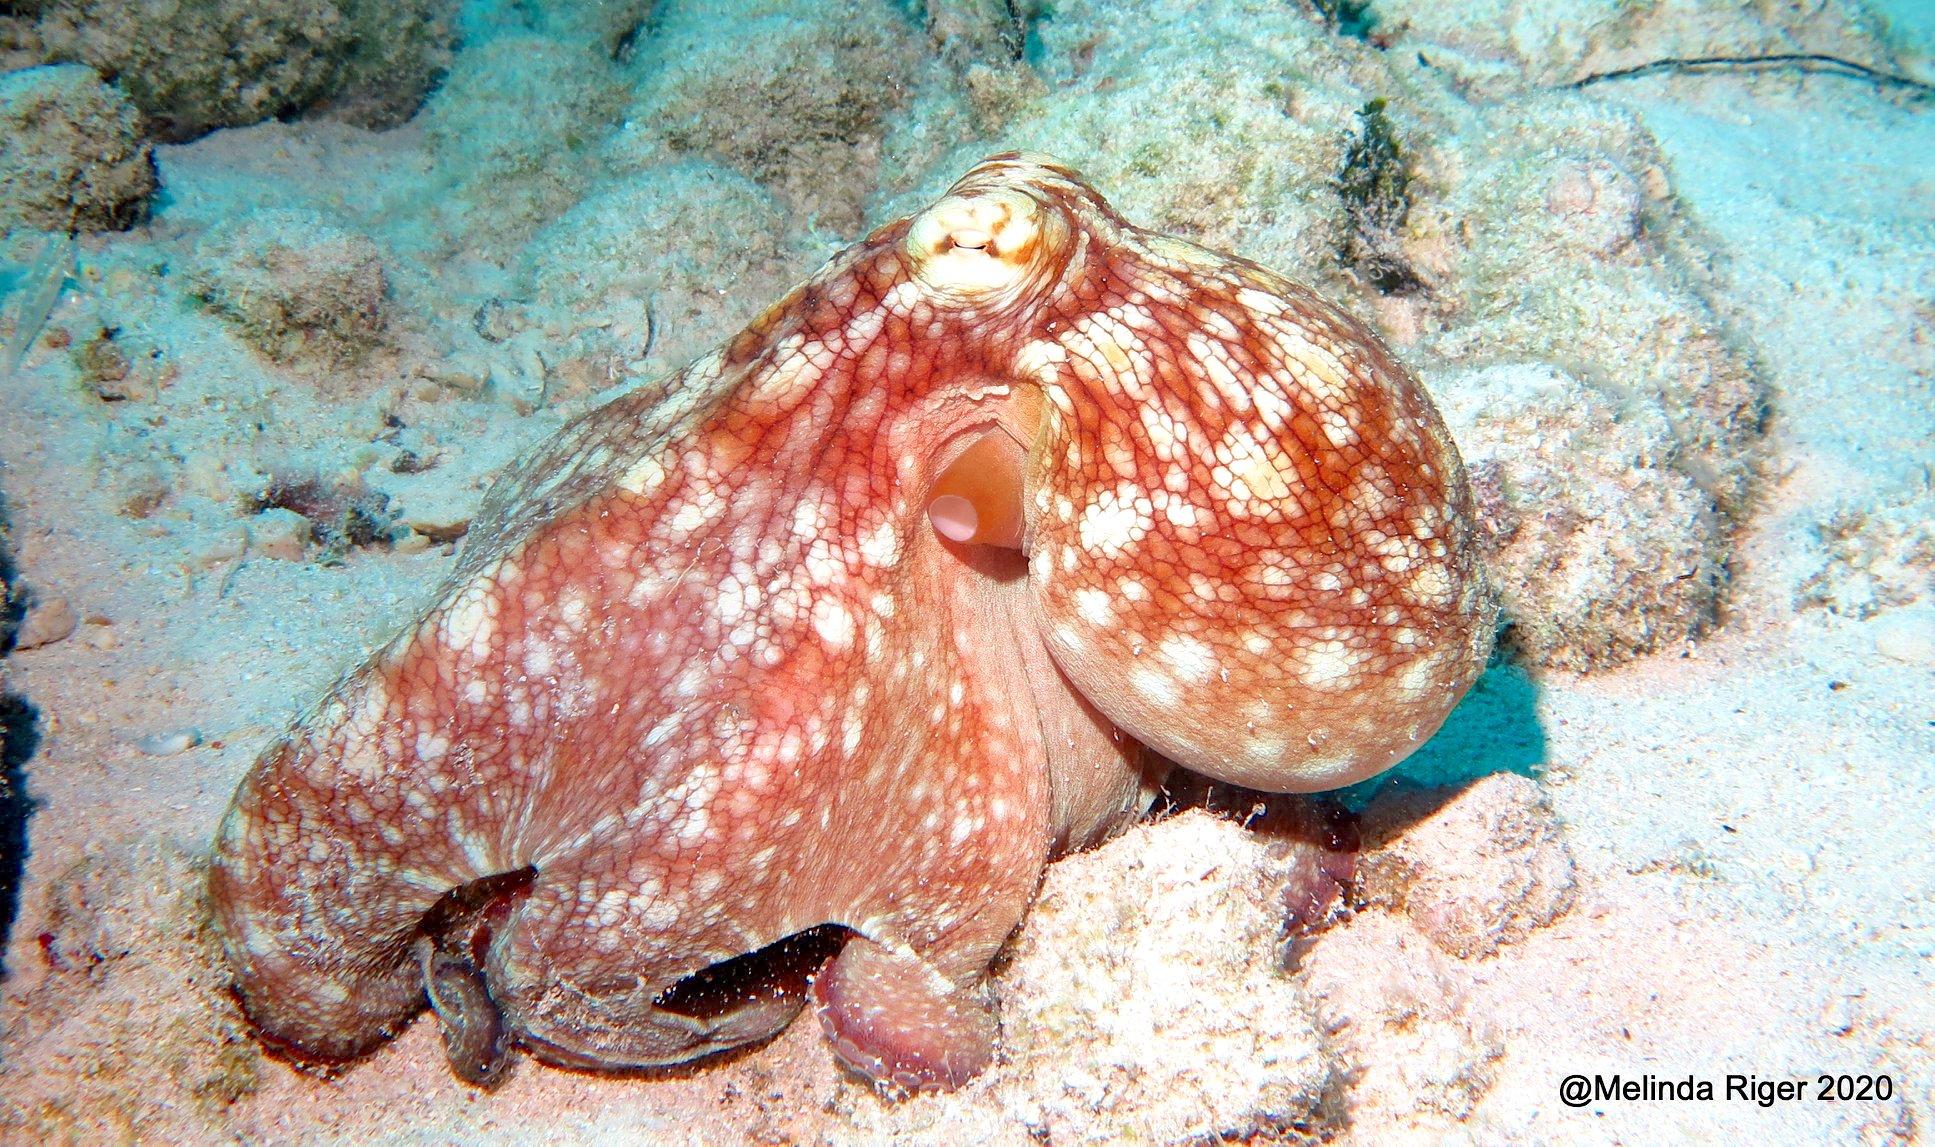 Octopus (Melinda Riger - Grand Bahama Scuba)